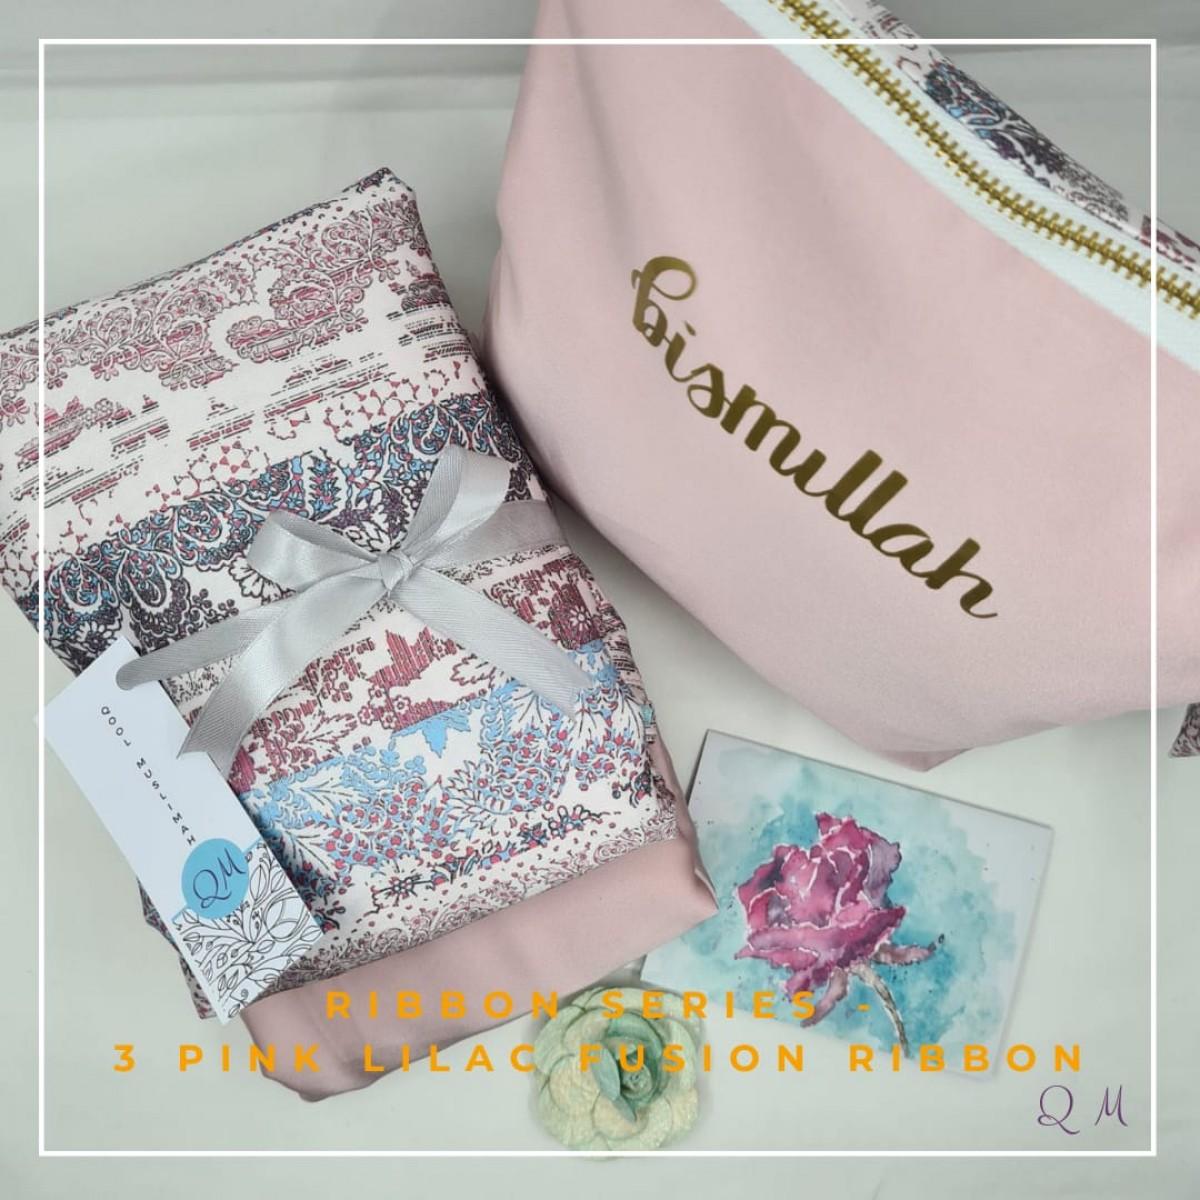 Telekung/Mukena Armani Silk Ribbon Series - Pink Lilac Fusion - Qool Muslimah